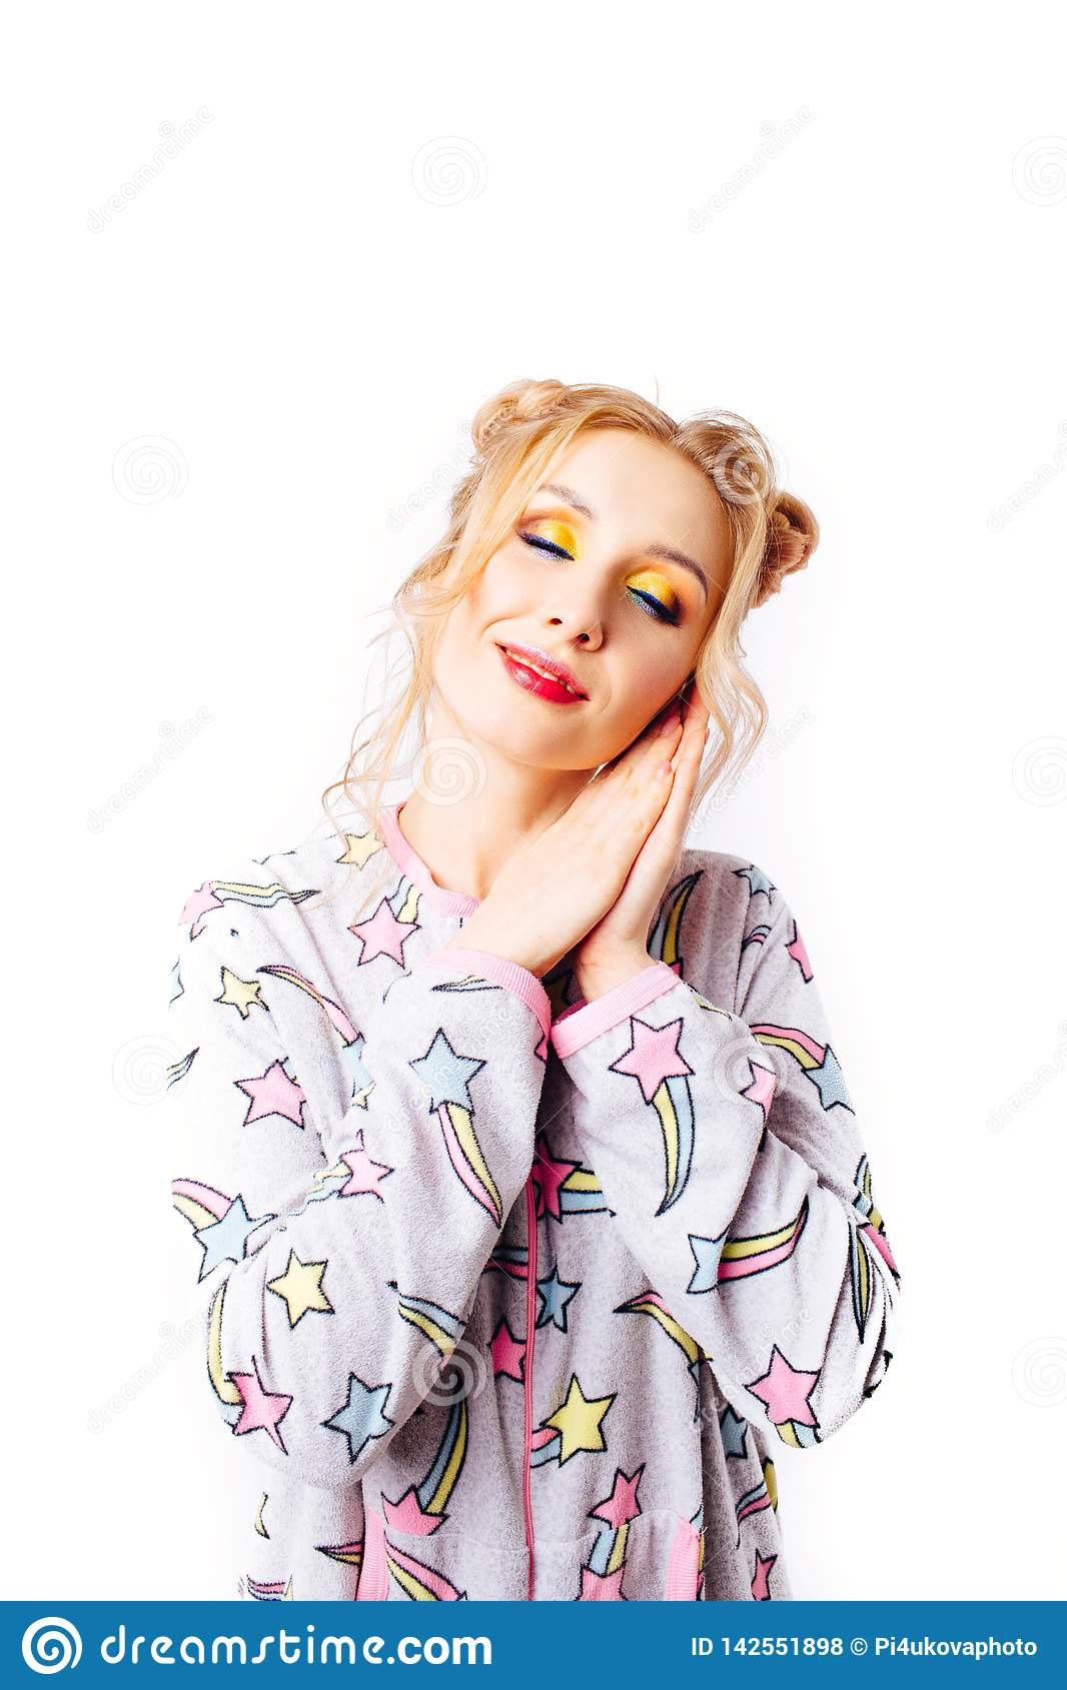 Sleeping girl in pajamas